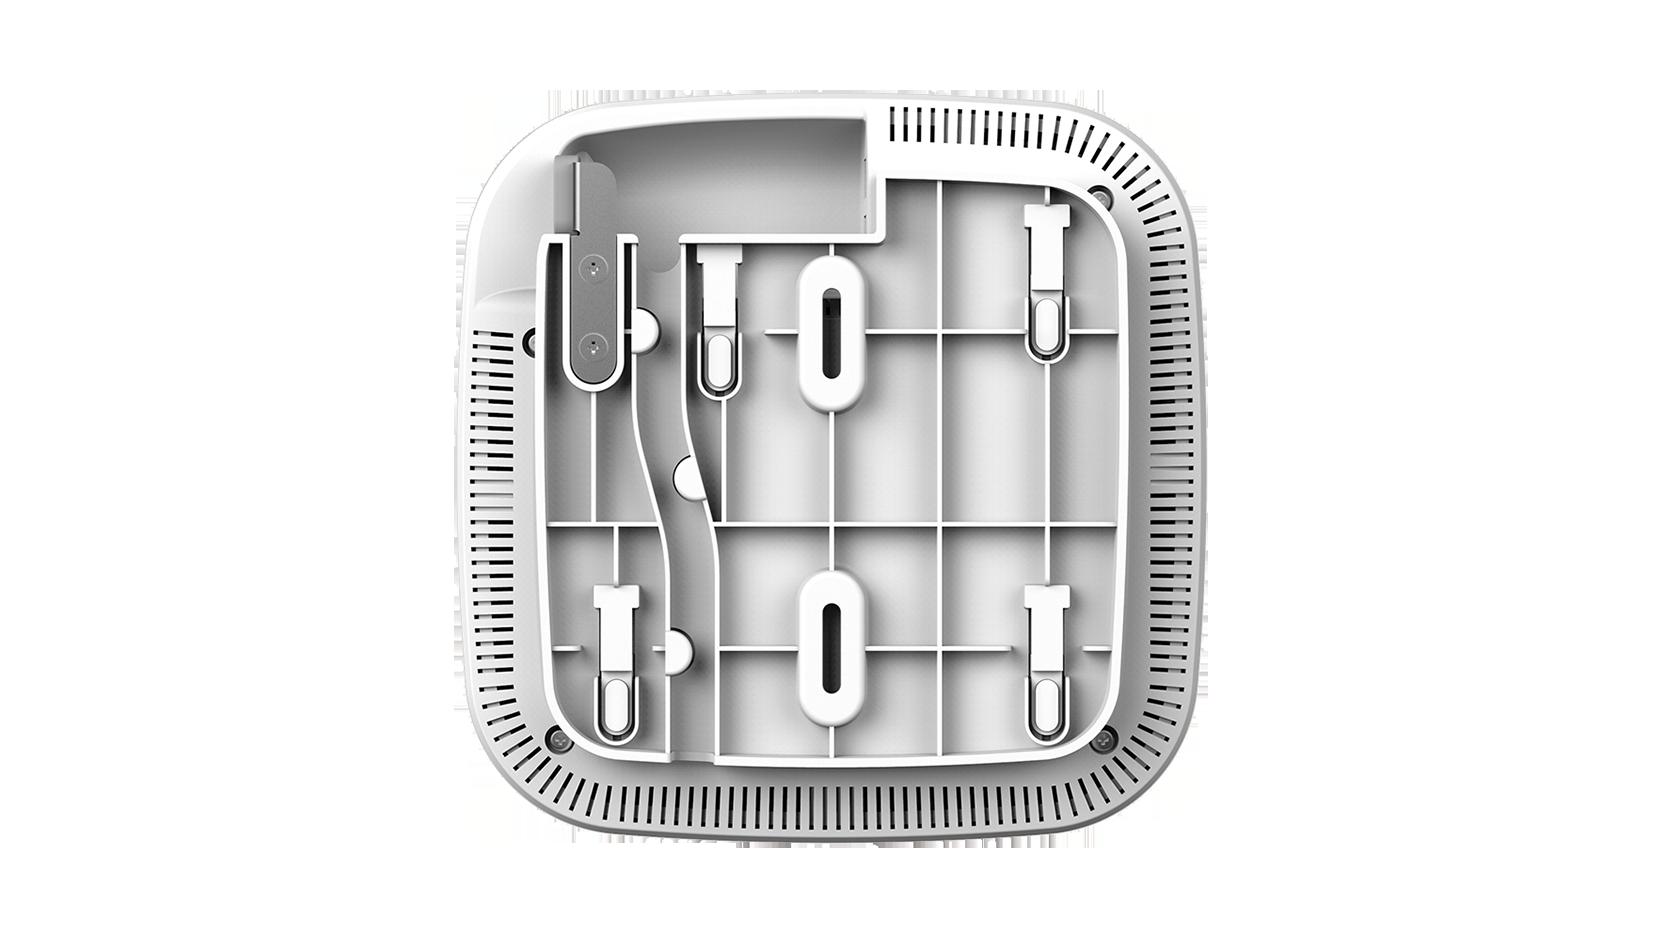 D-LINK DAP-2660 REV.A ACCESS POINT DRIVER FOR WINDOWS MAC